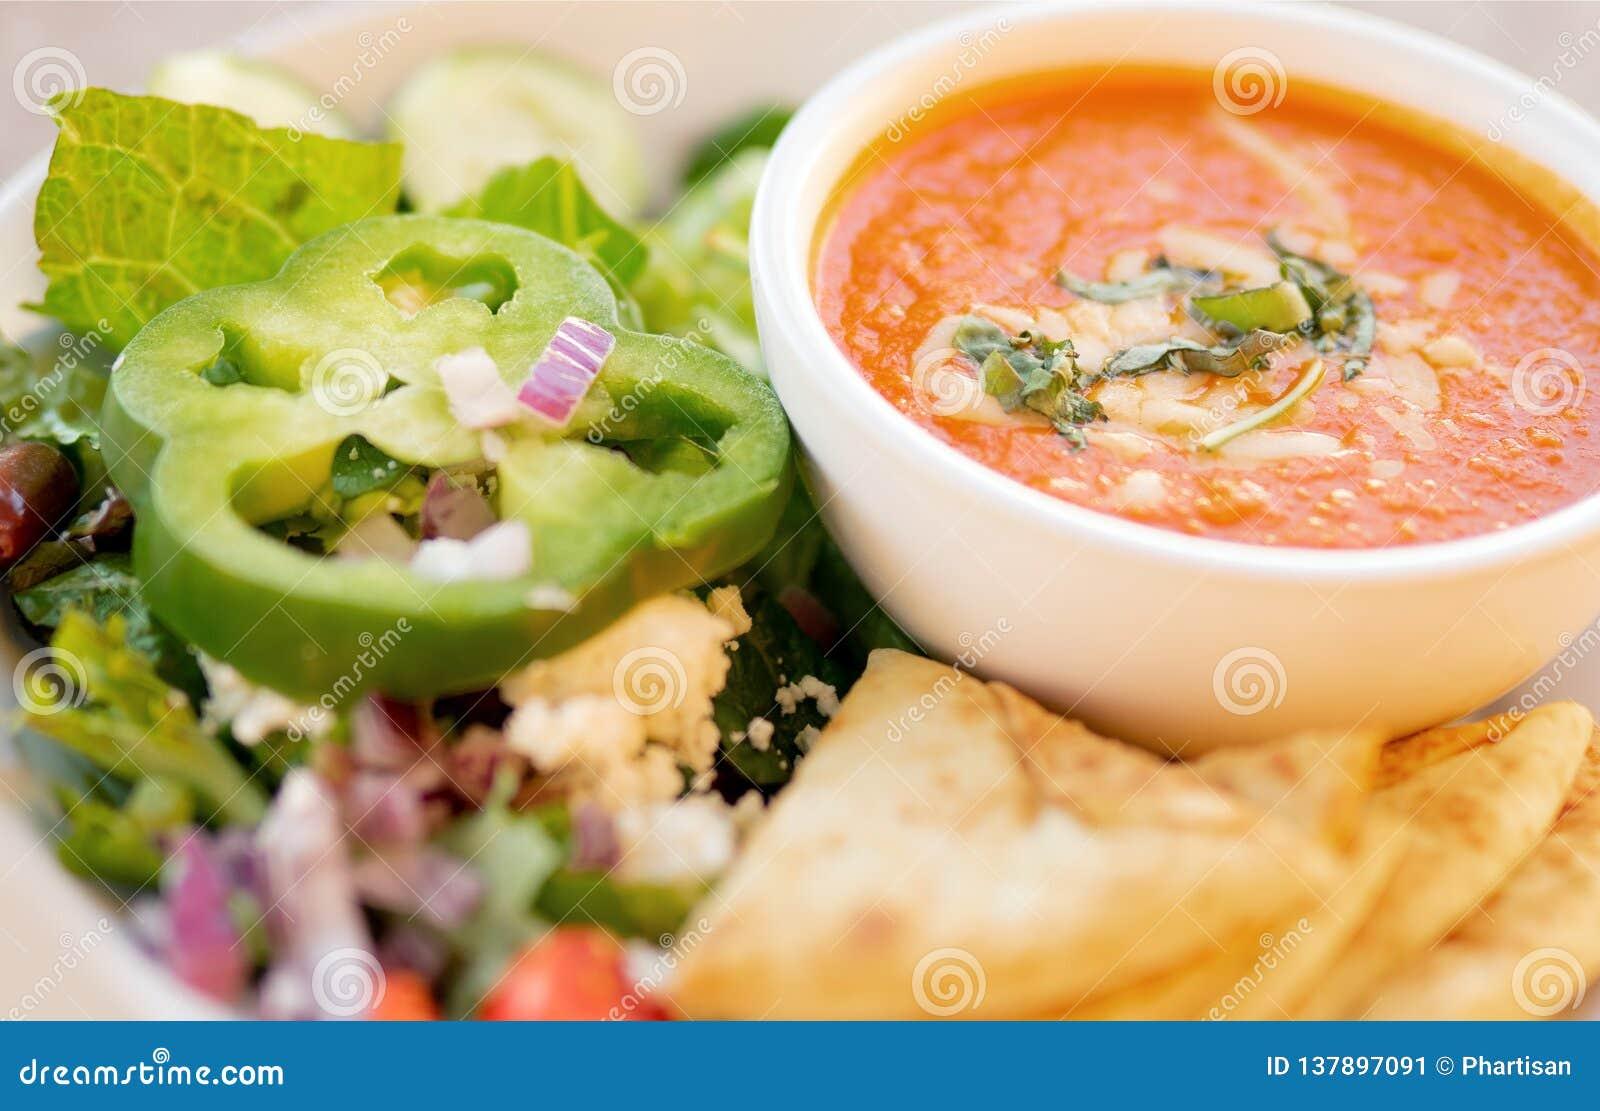 Minestra ed insalata sane, minestra del pomodoro